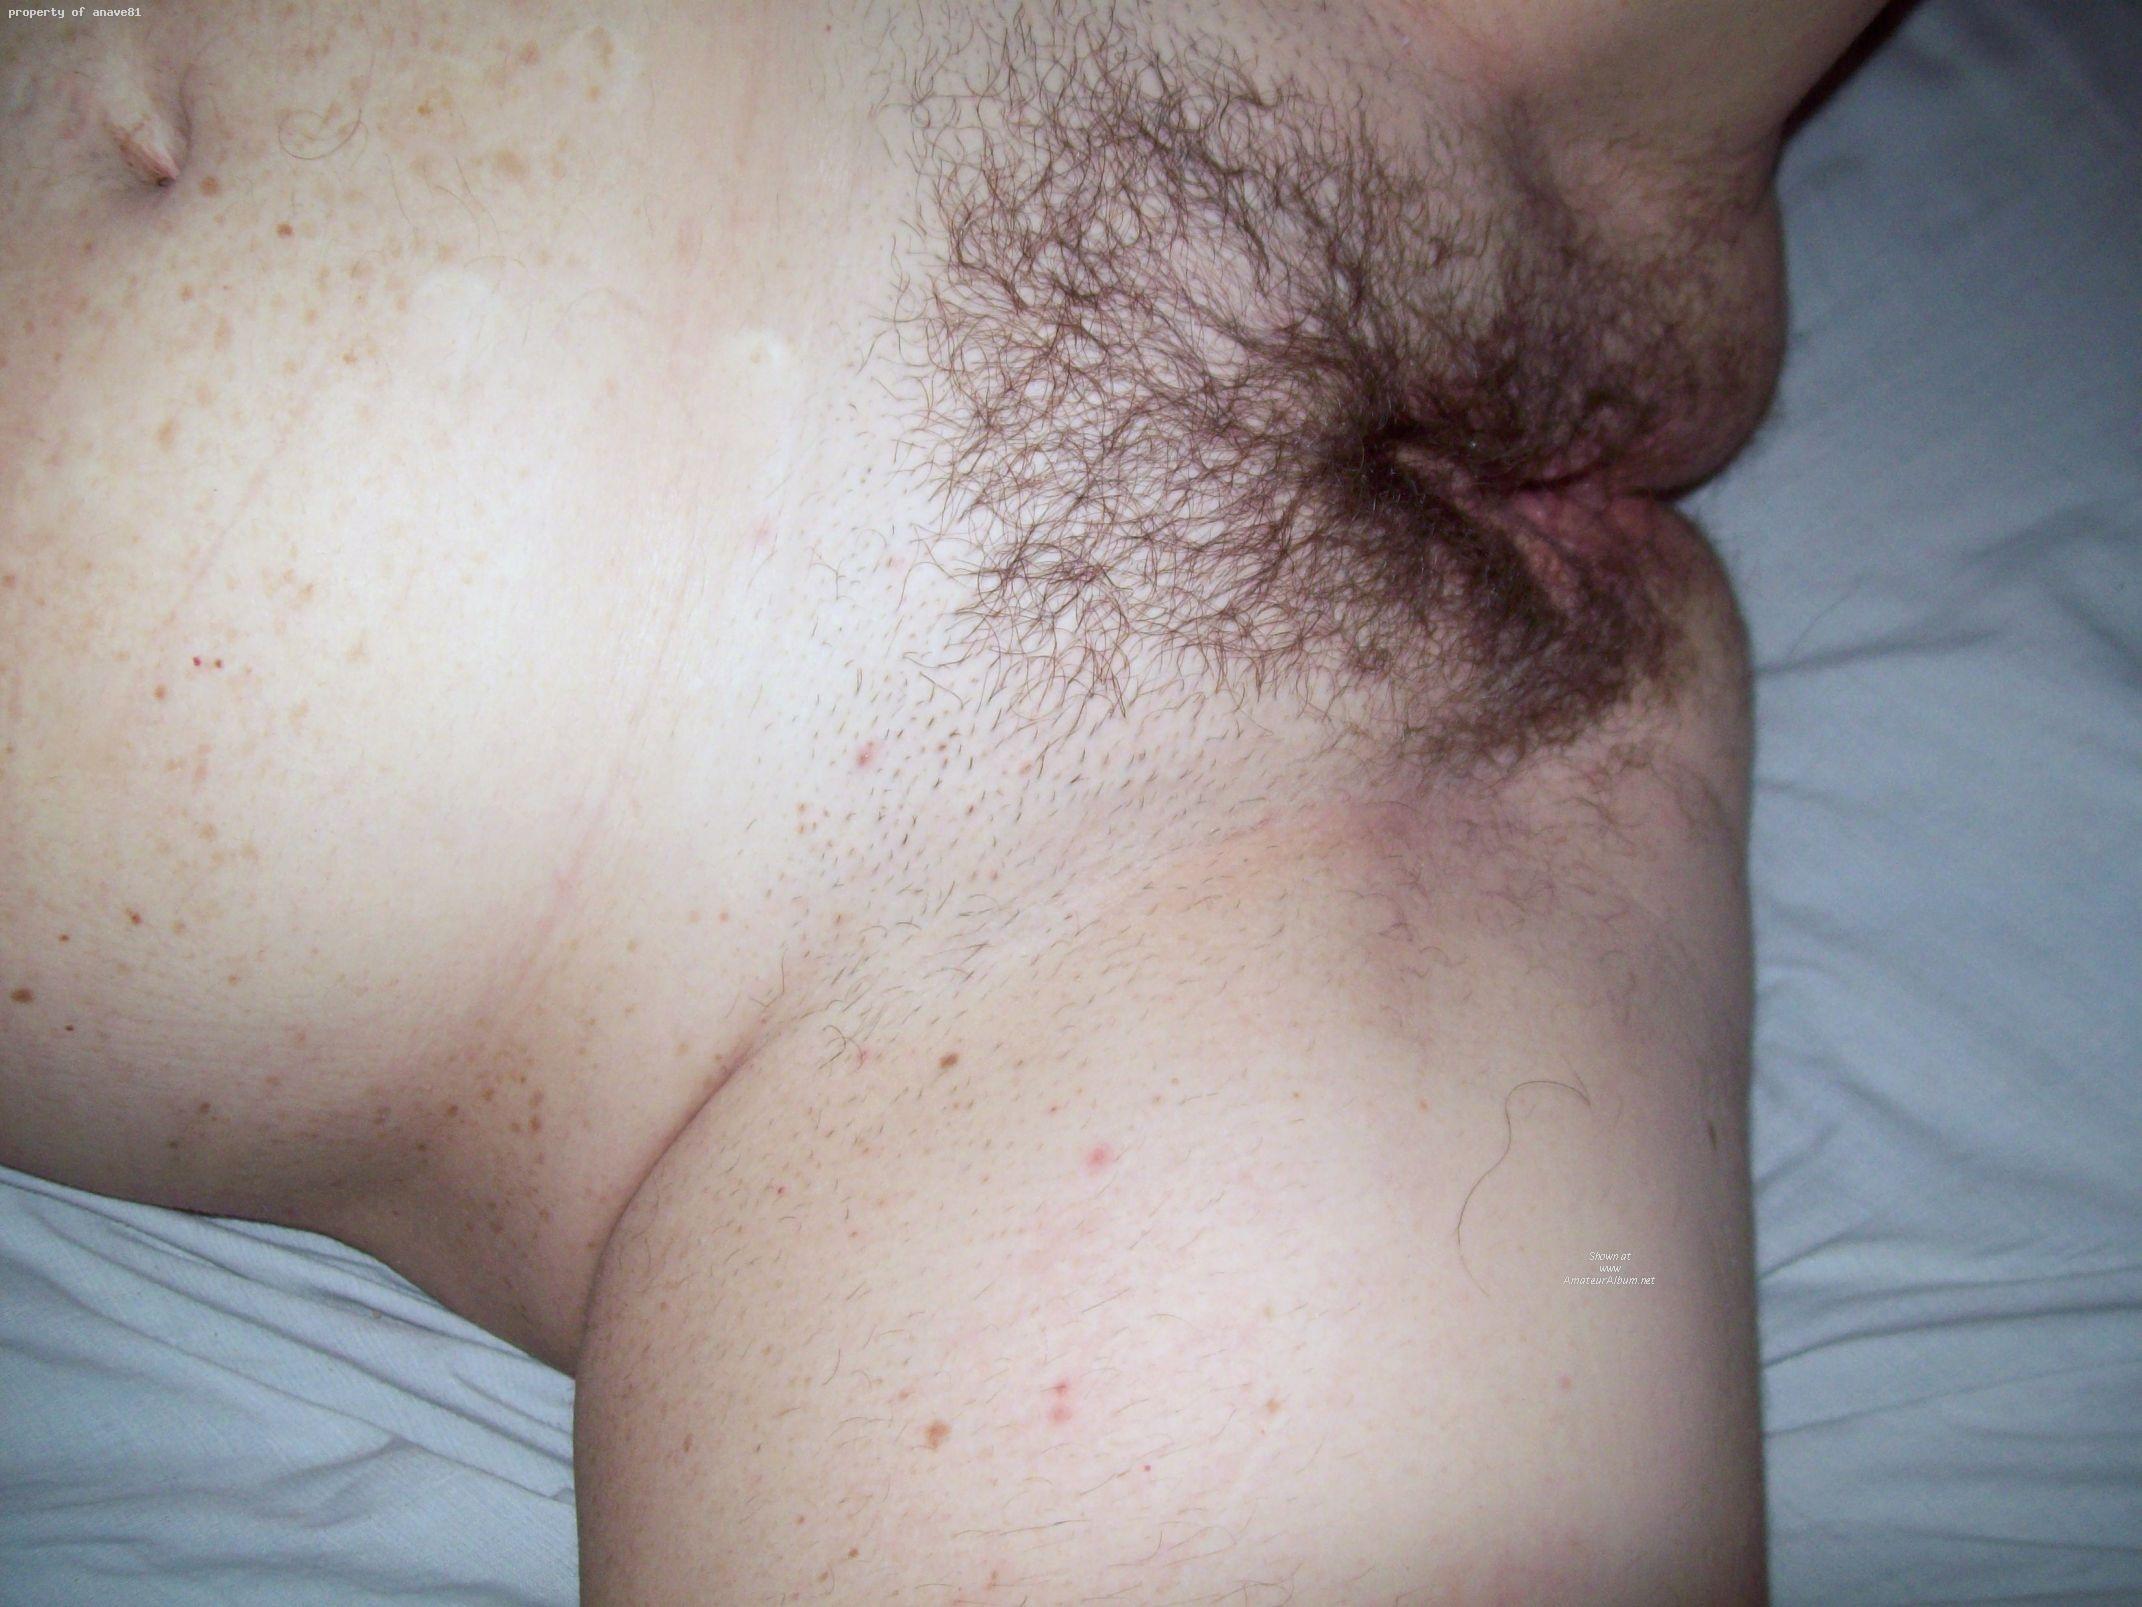 Poringa Posts Imagenes Vaginas Peludas Html Filmvz Portal